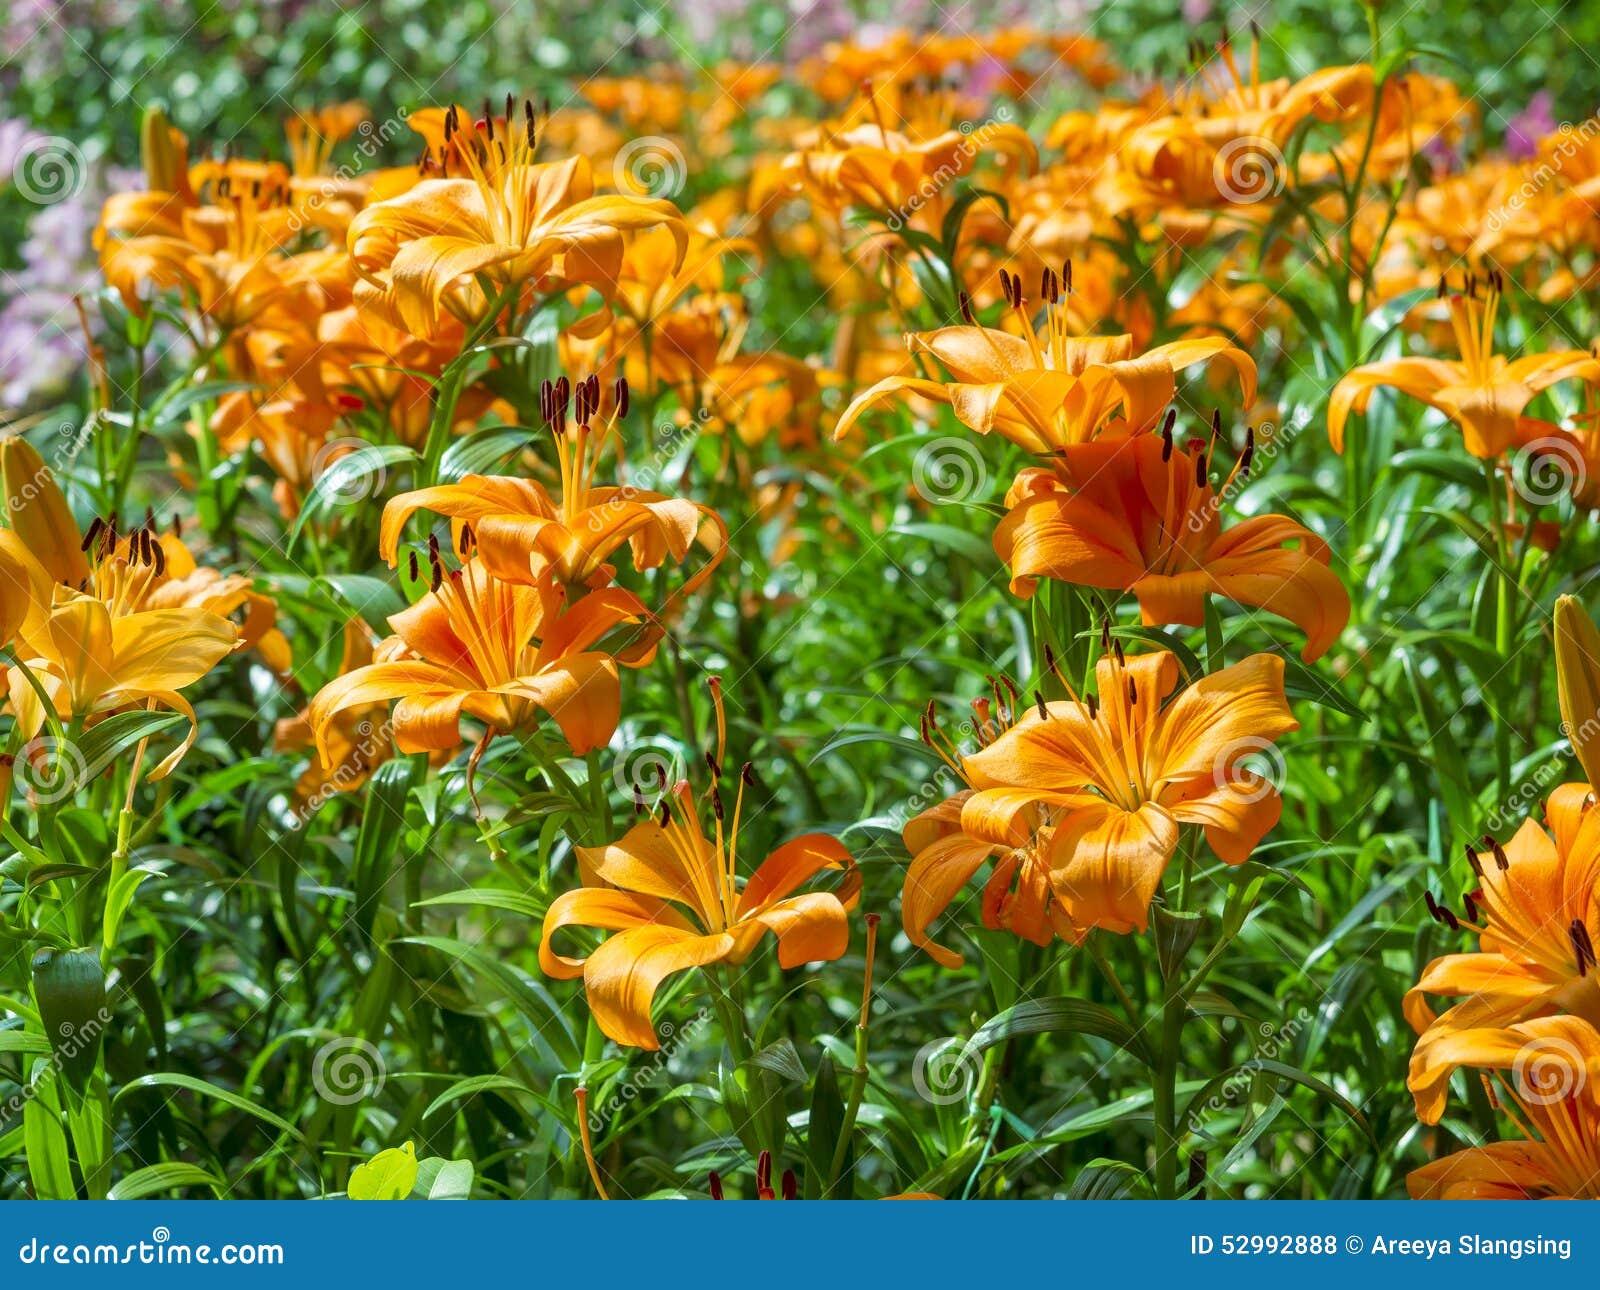 Orange color on fresh lily flowers stock photo image of floral orange color on fresh lily flowers izmirmasajfo Choice Image